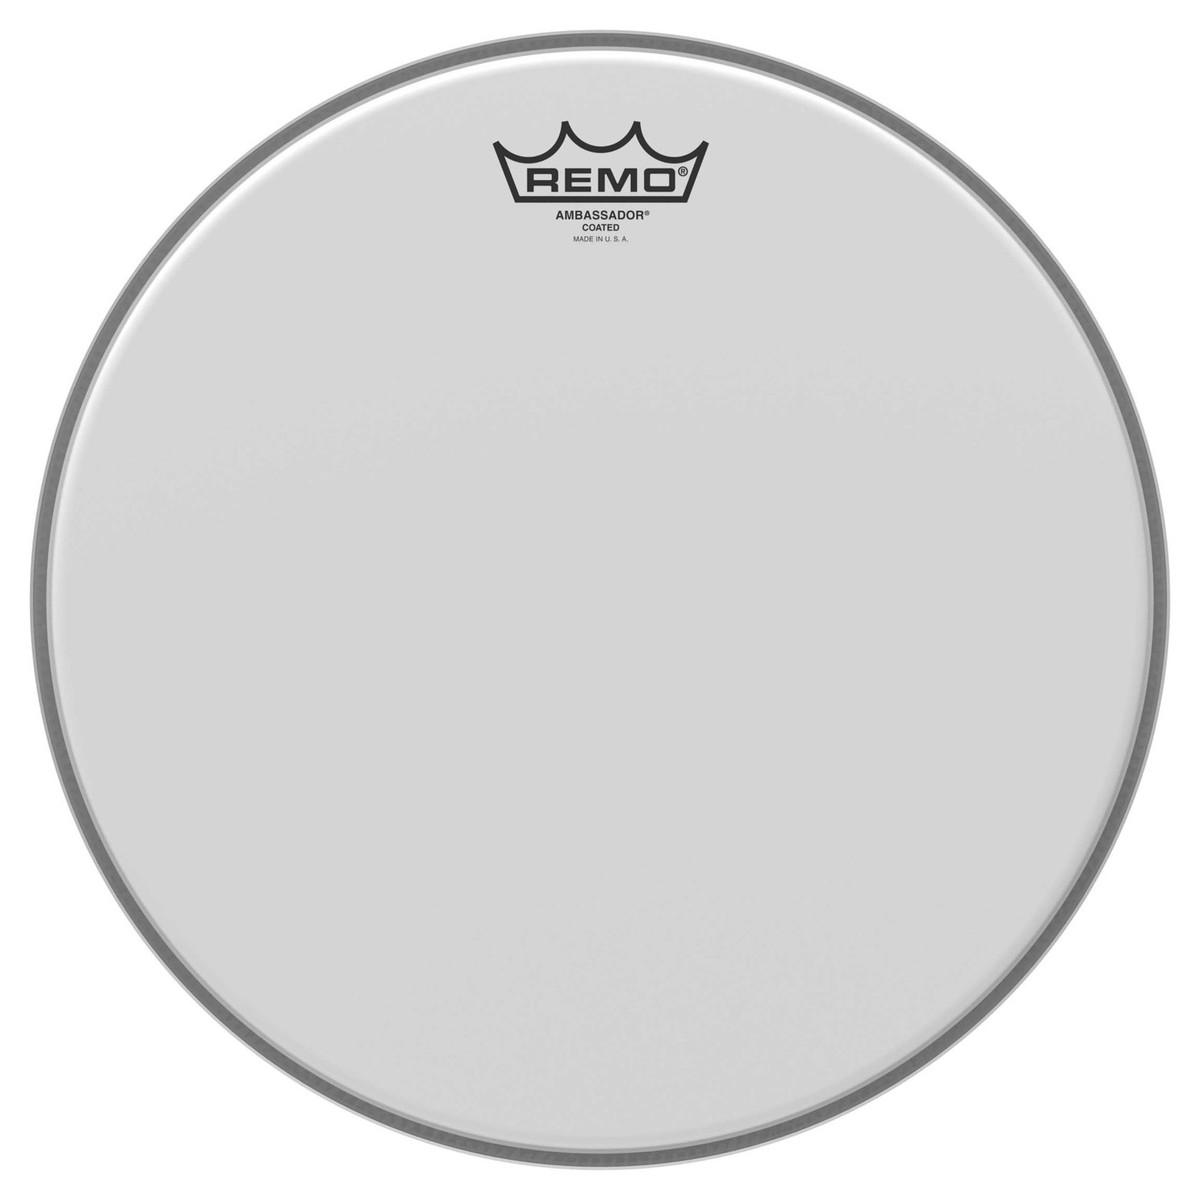 Remo Ambassador Coated 13 Drum Head